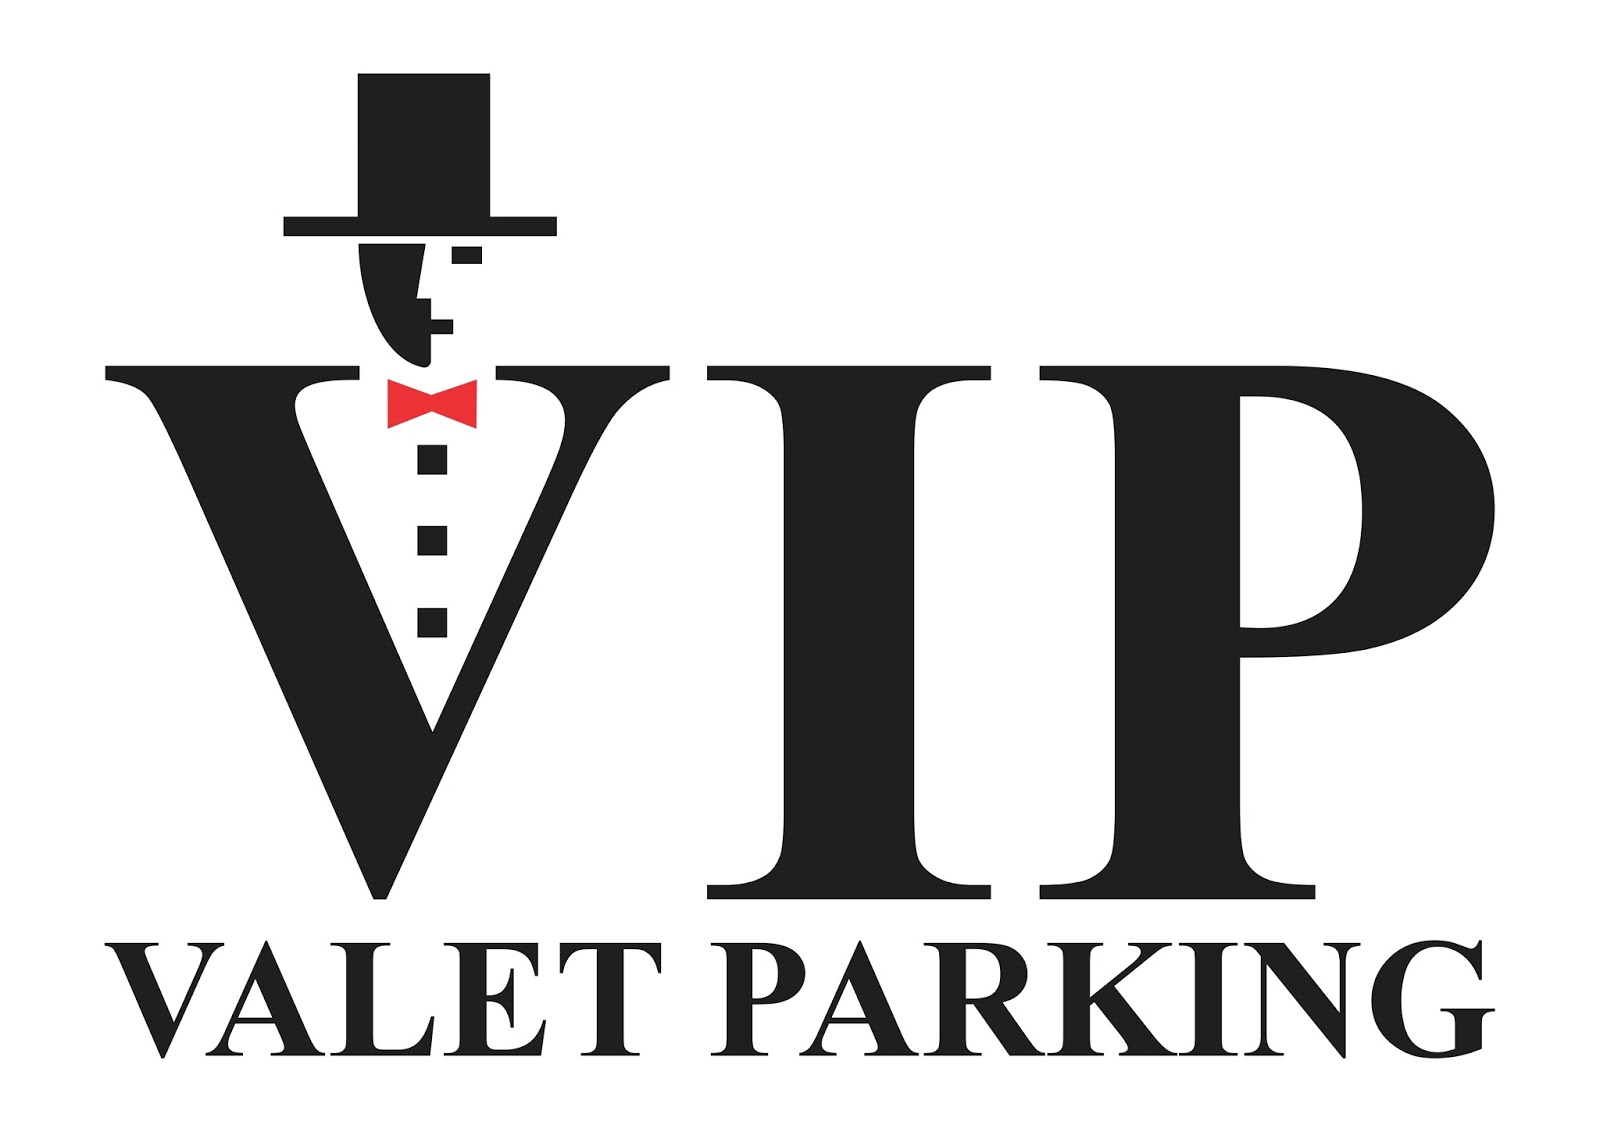 Lowongan Kerja It Marketing Amp Valet Di Vip Valet Parking